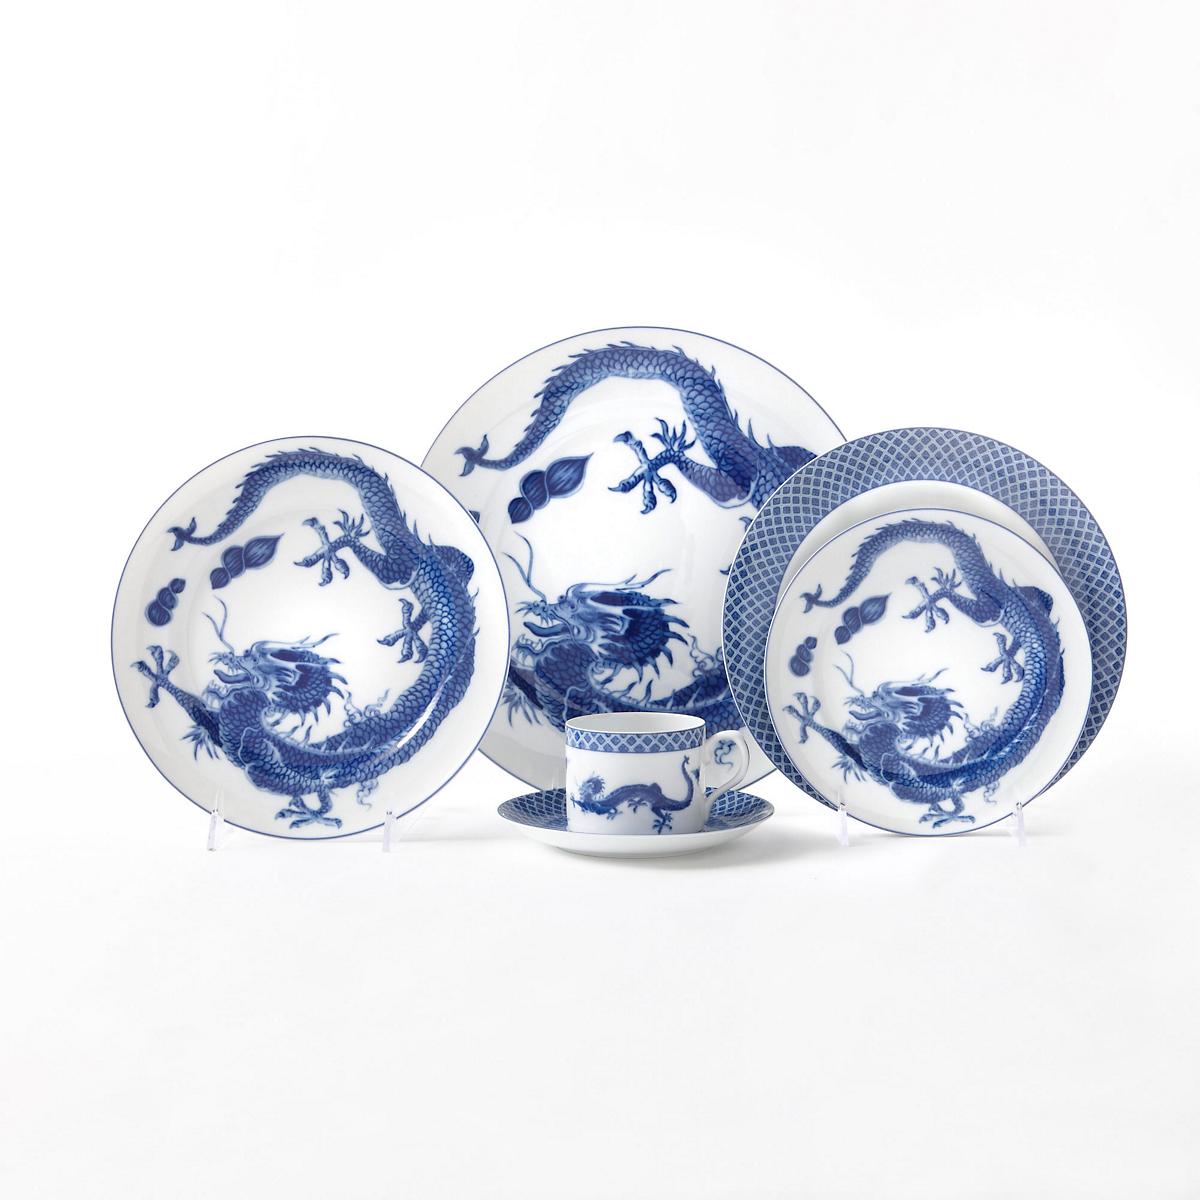 Mottahedeh Dragon Dinnerware Blue  sc 1 st  Gumpu0027s & Mottahedeh Dragon Dinnerware Blue | Gumpu0027s